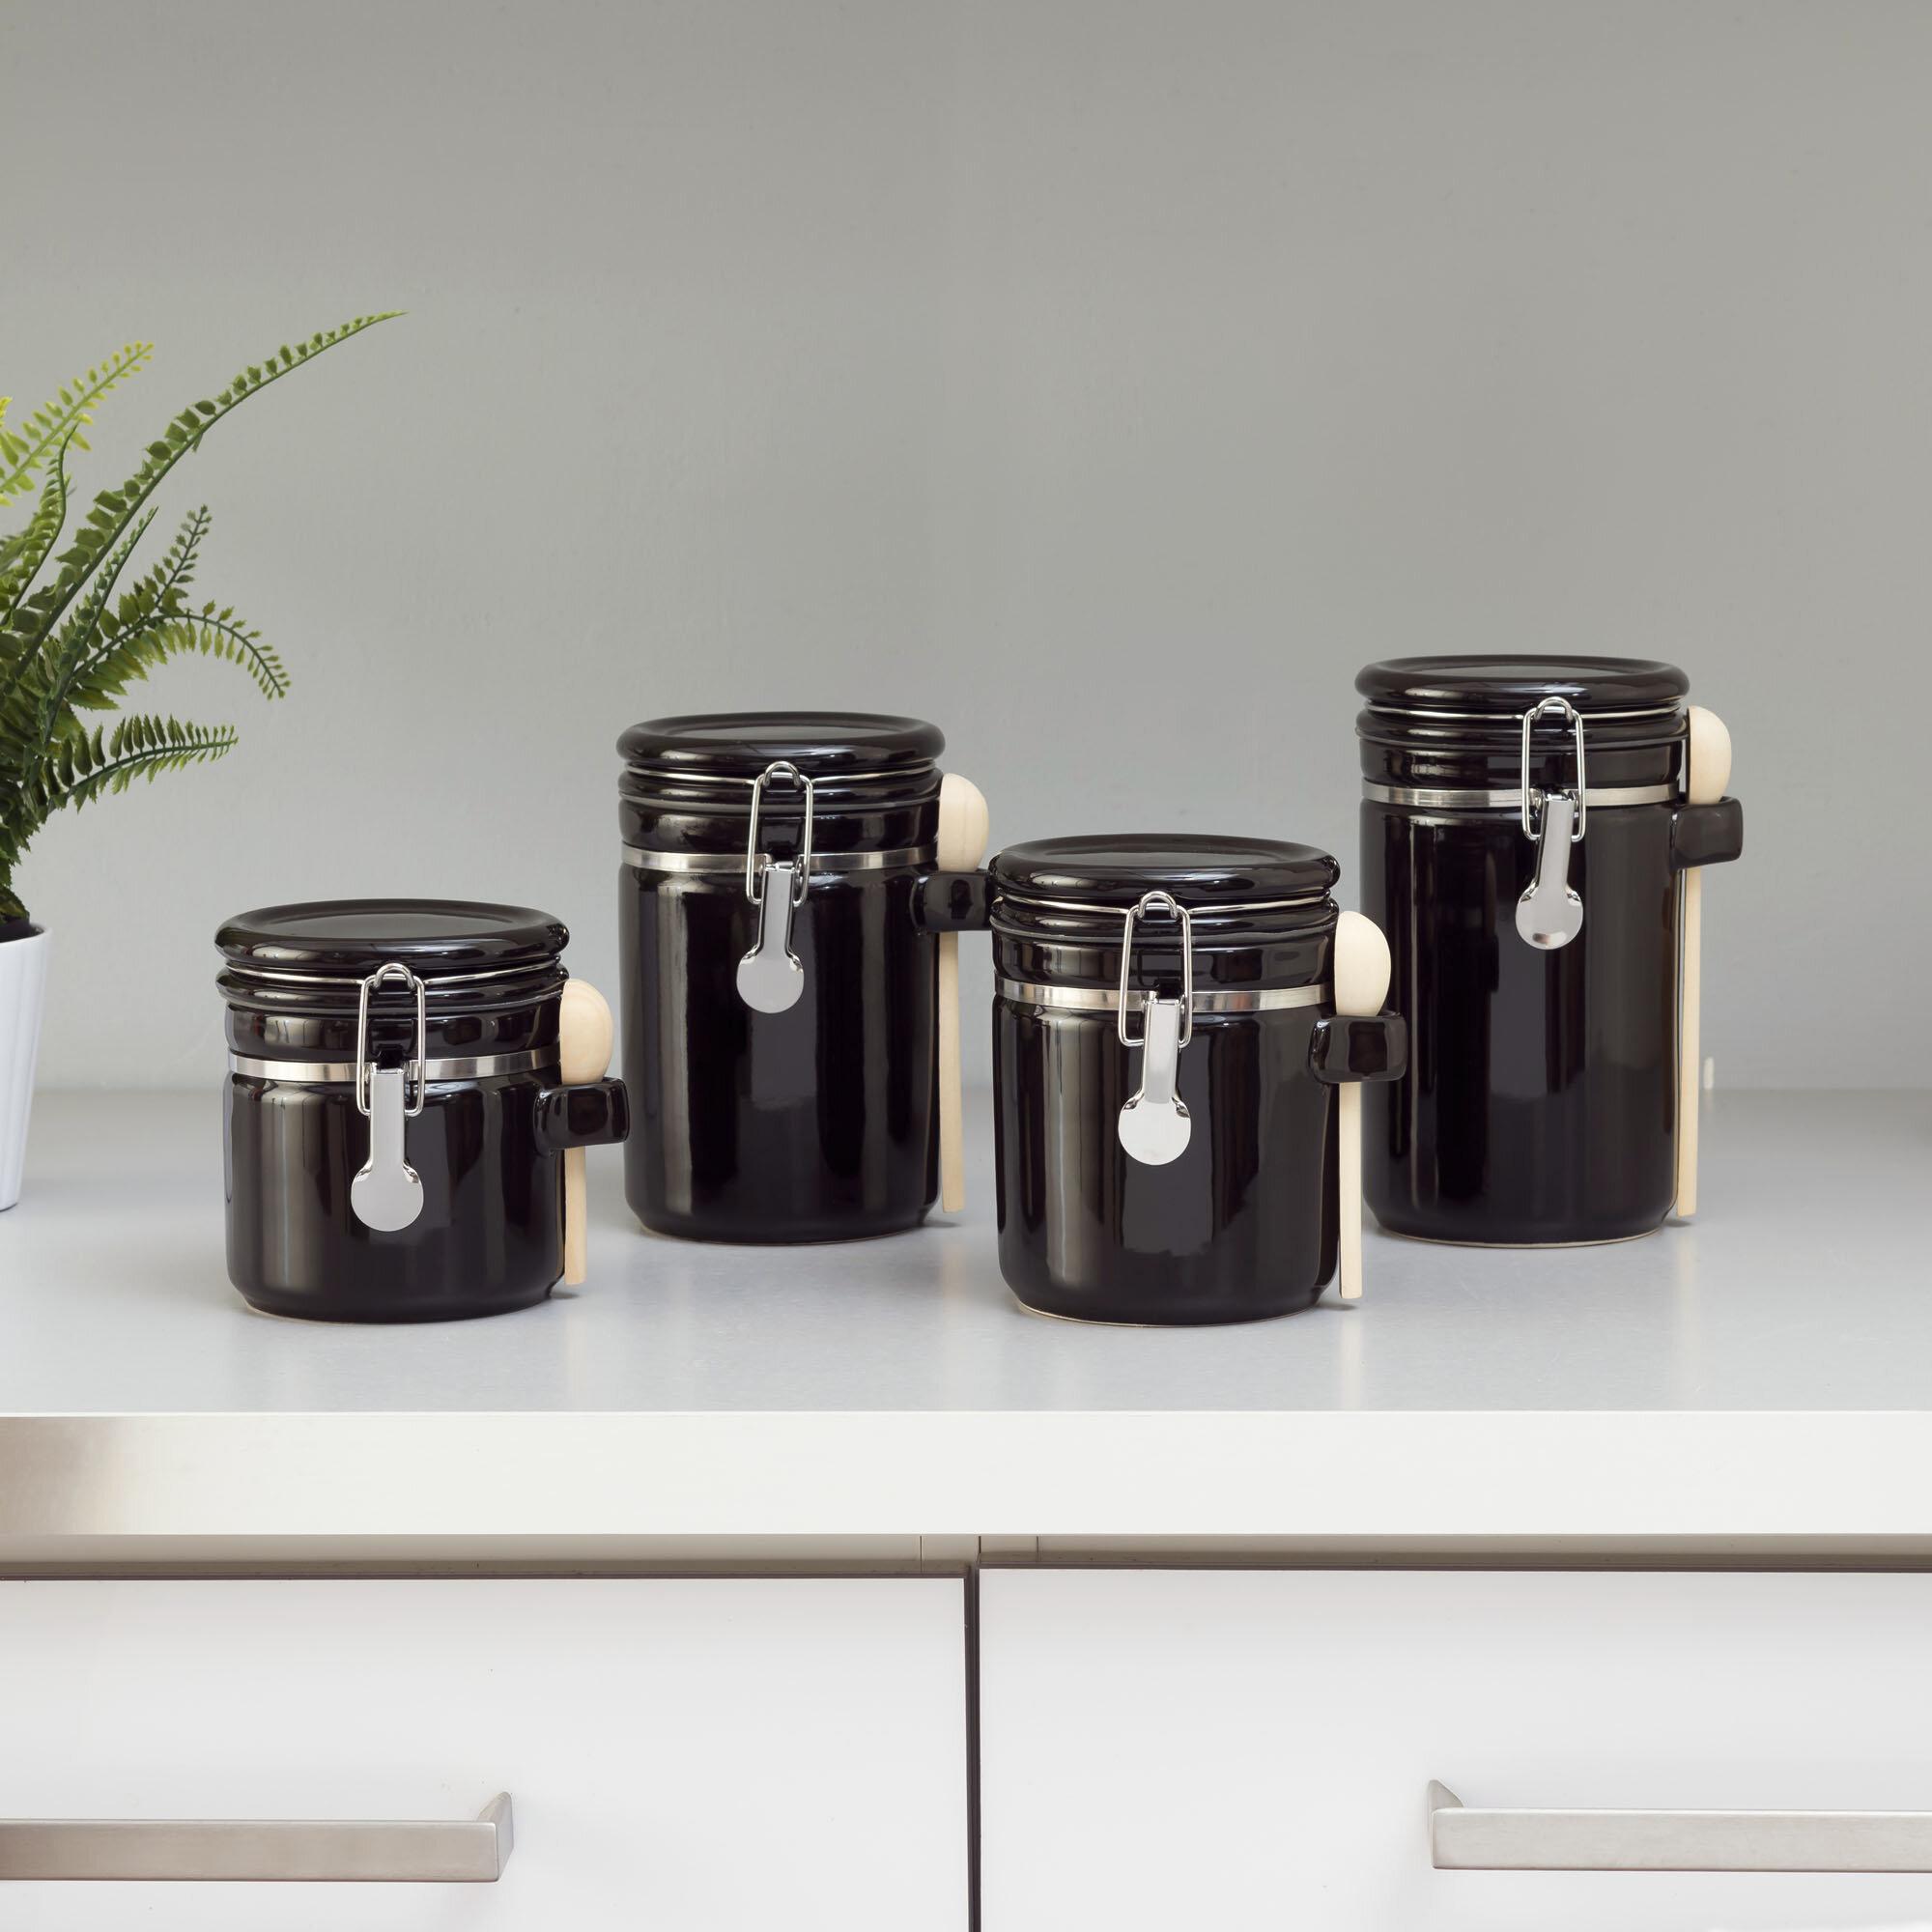 Gracie Oaks 4 Piece Ceramic Kitchen Canister Set Reviews Wayfair